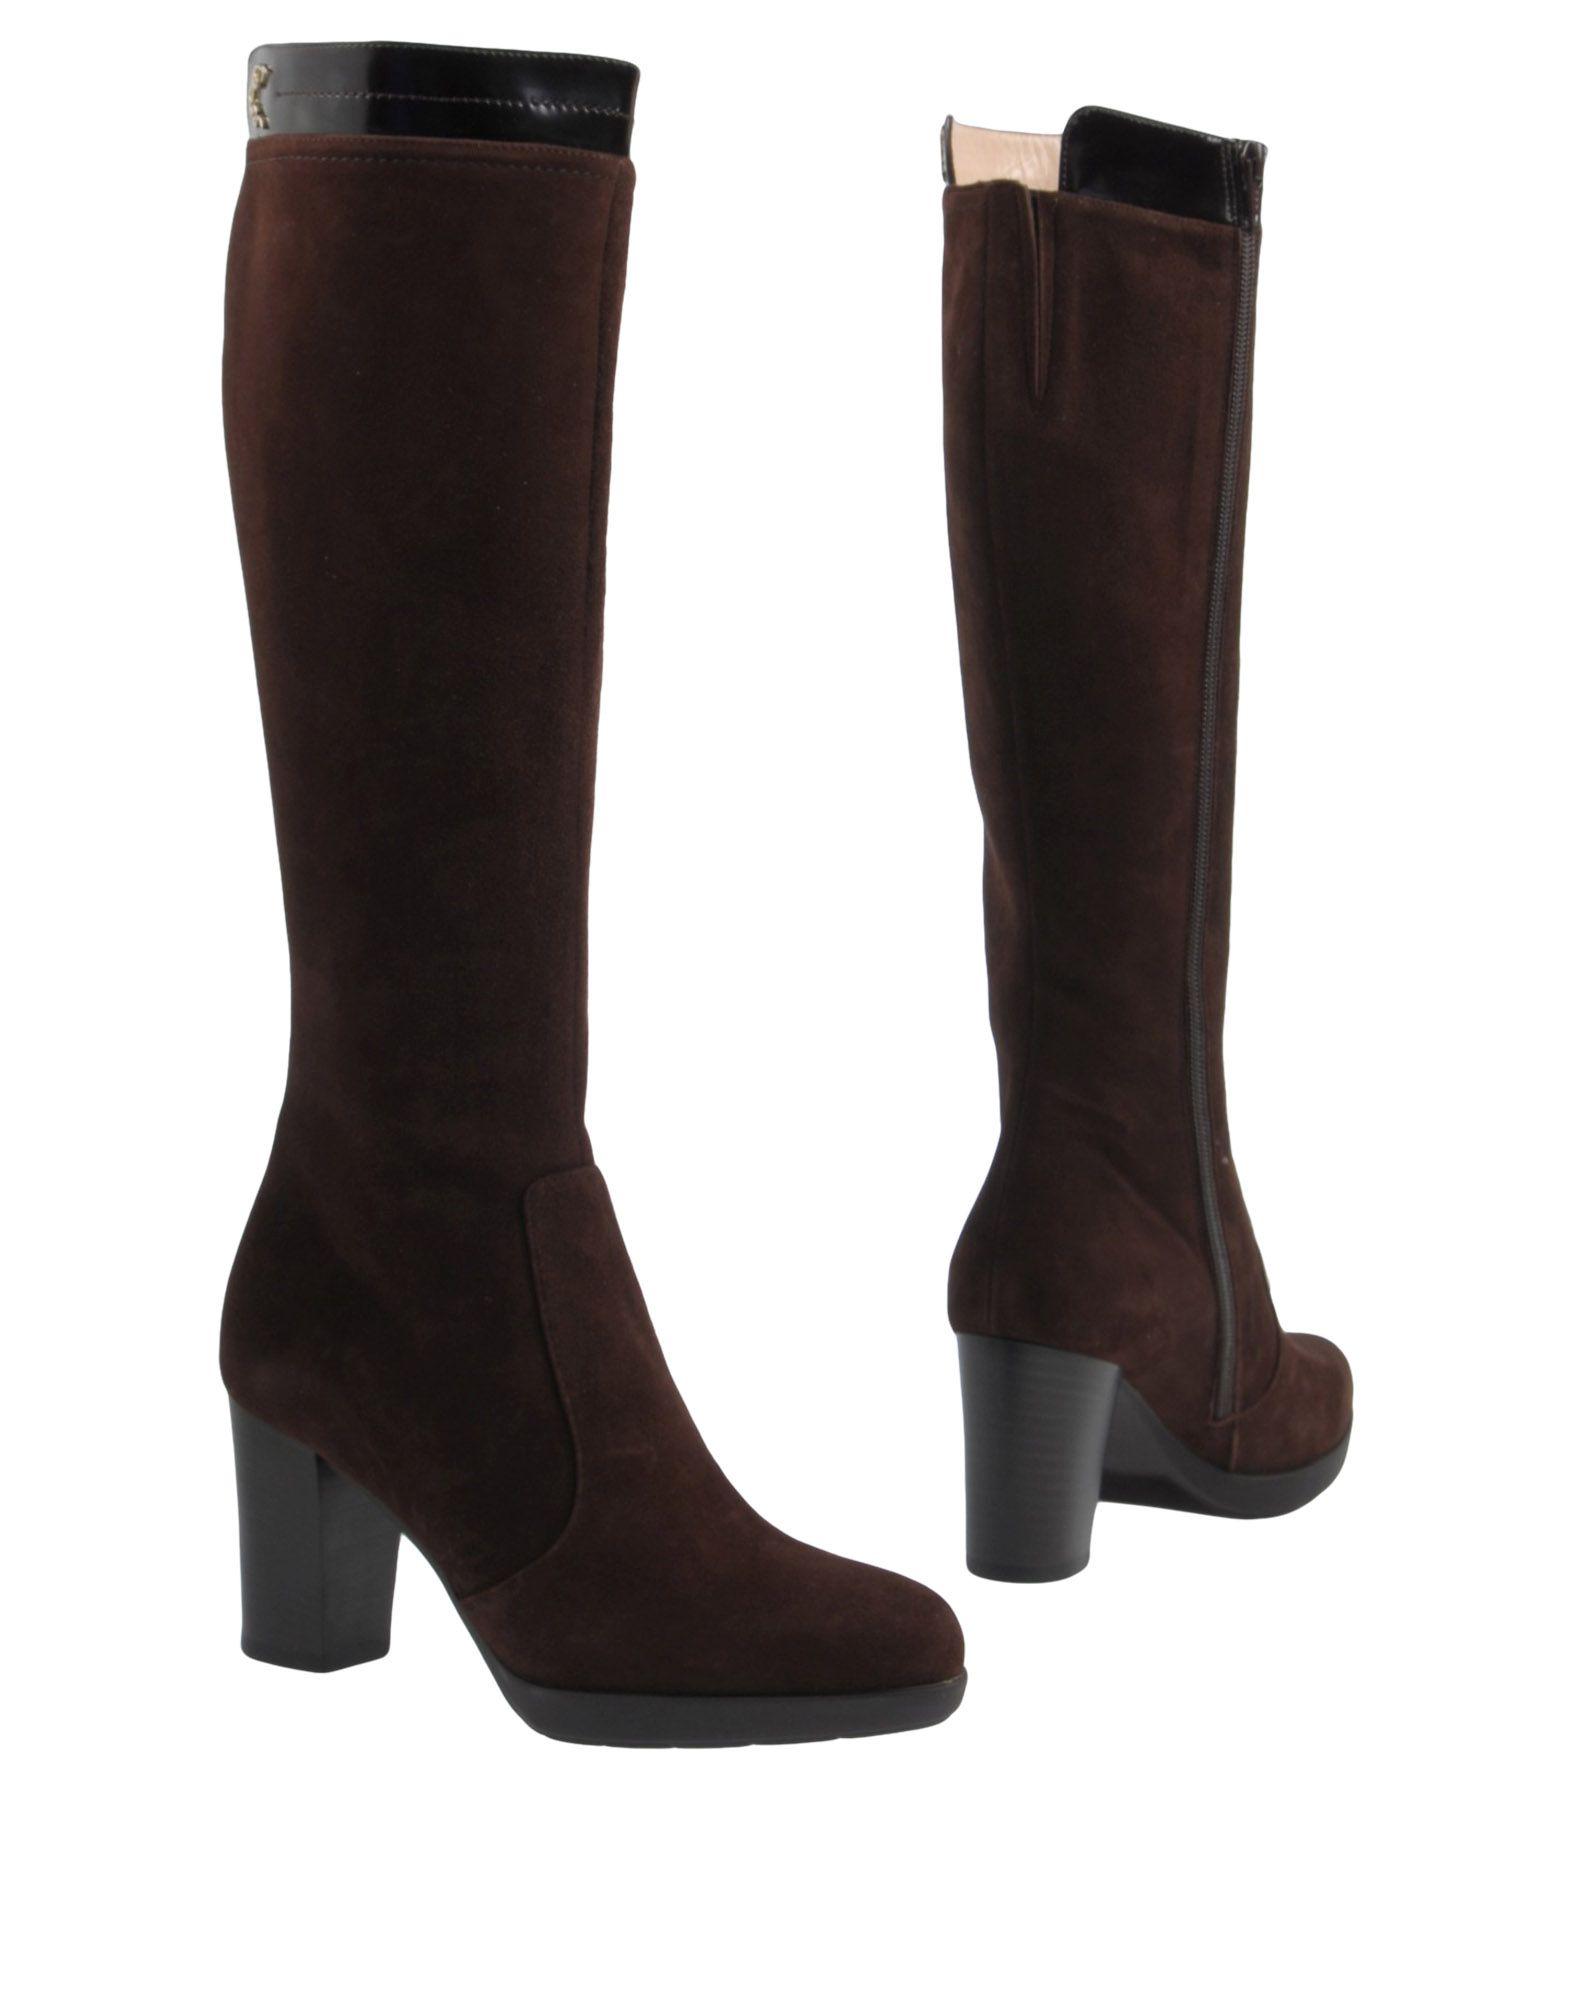 Norma J.Baker Stiefel Damen  11447598UO Beliebte Schuhe